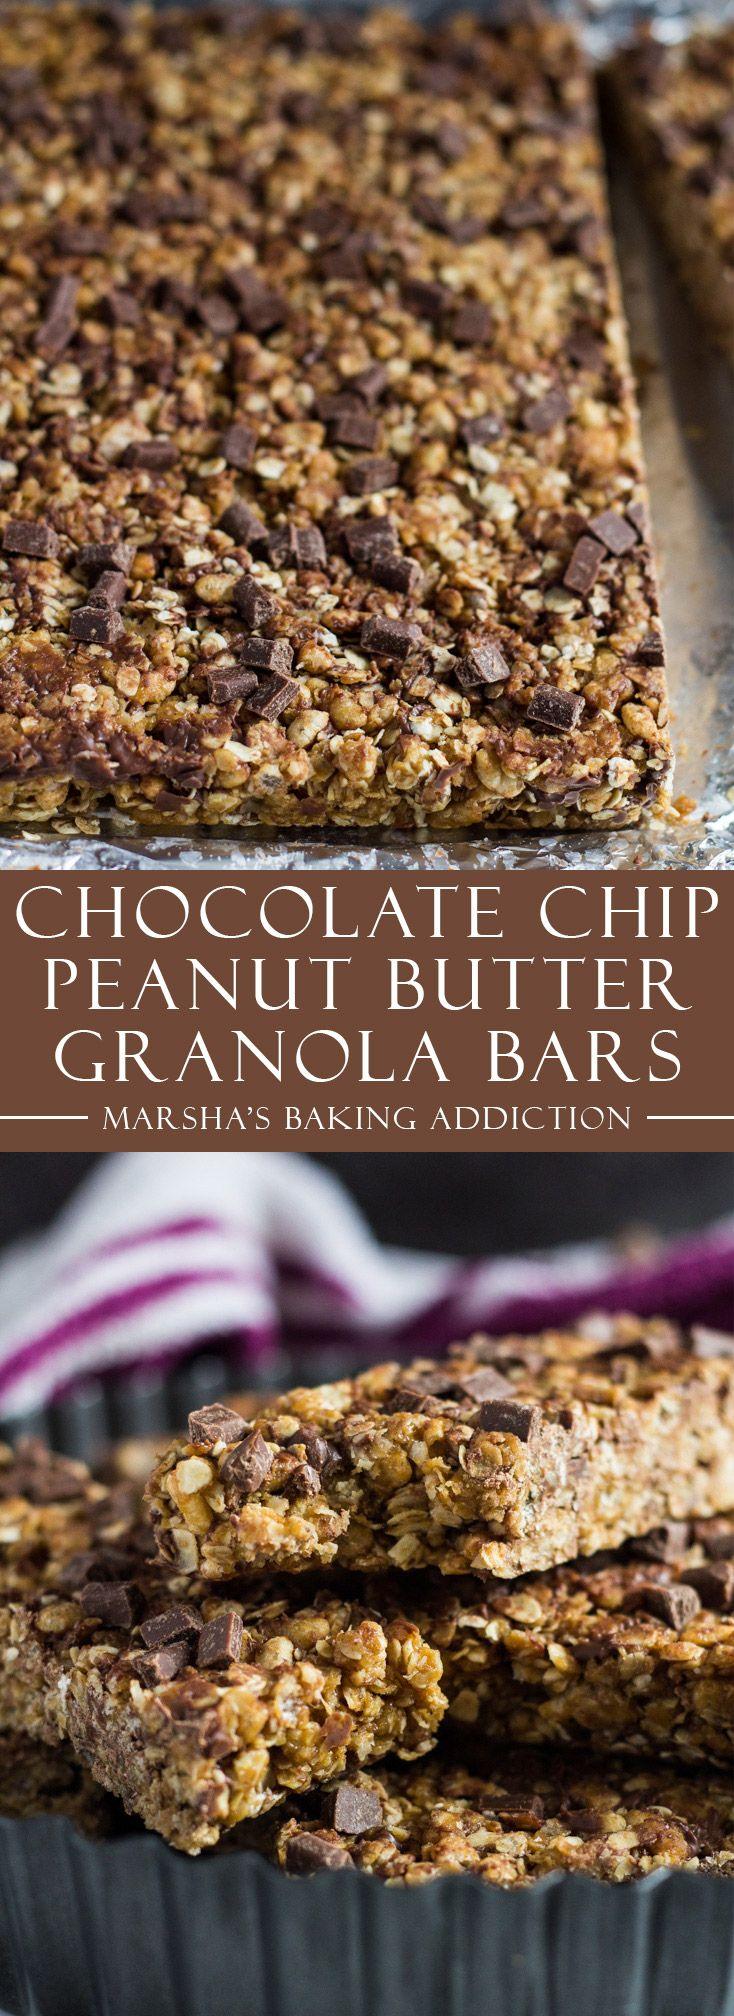 No-Bake+Chocolate+Chip+Peanut+Butter+Granola+Bars+ +marshasbakingaddiction.com+@marshasbakeblog